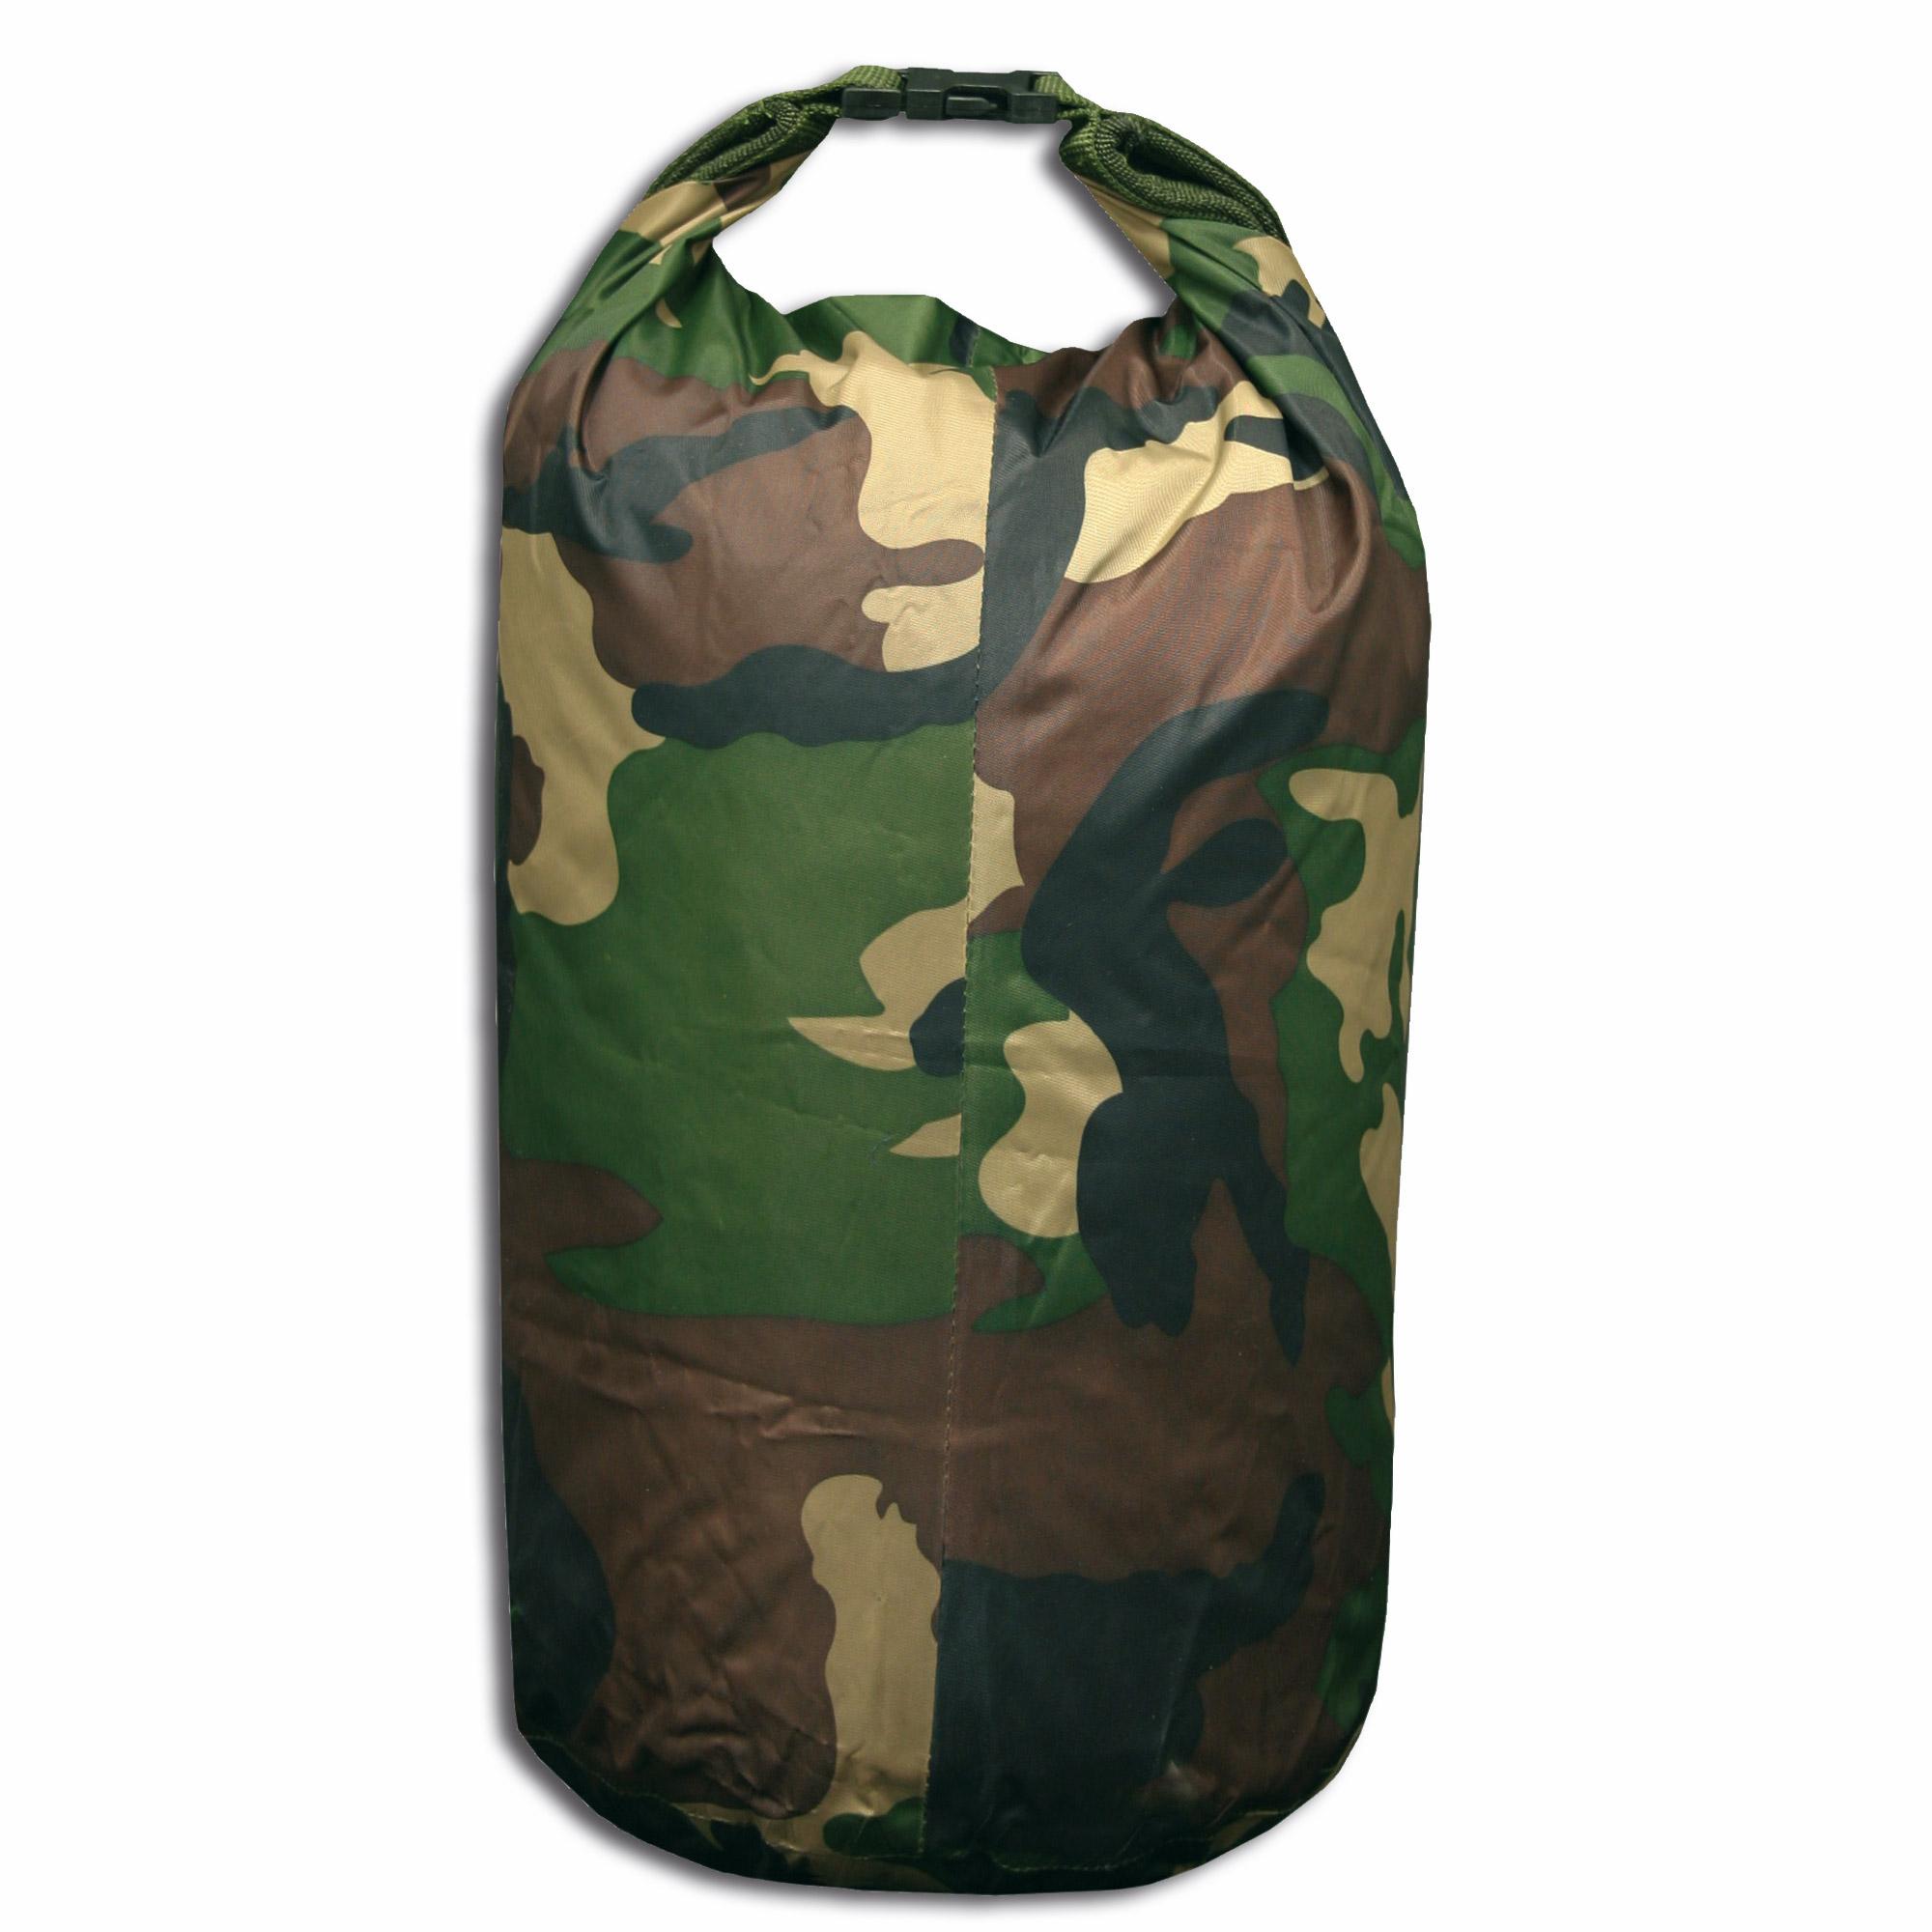 Sac de transport MFH p.m. camouflage